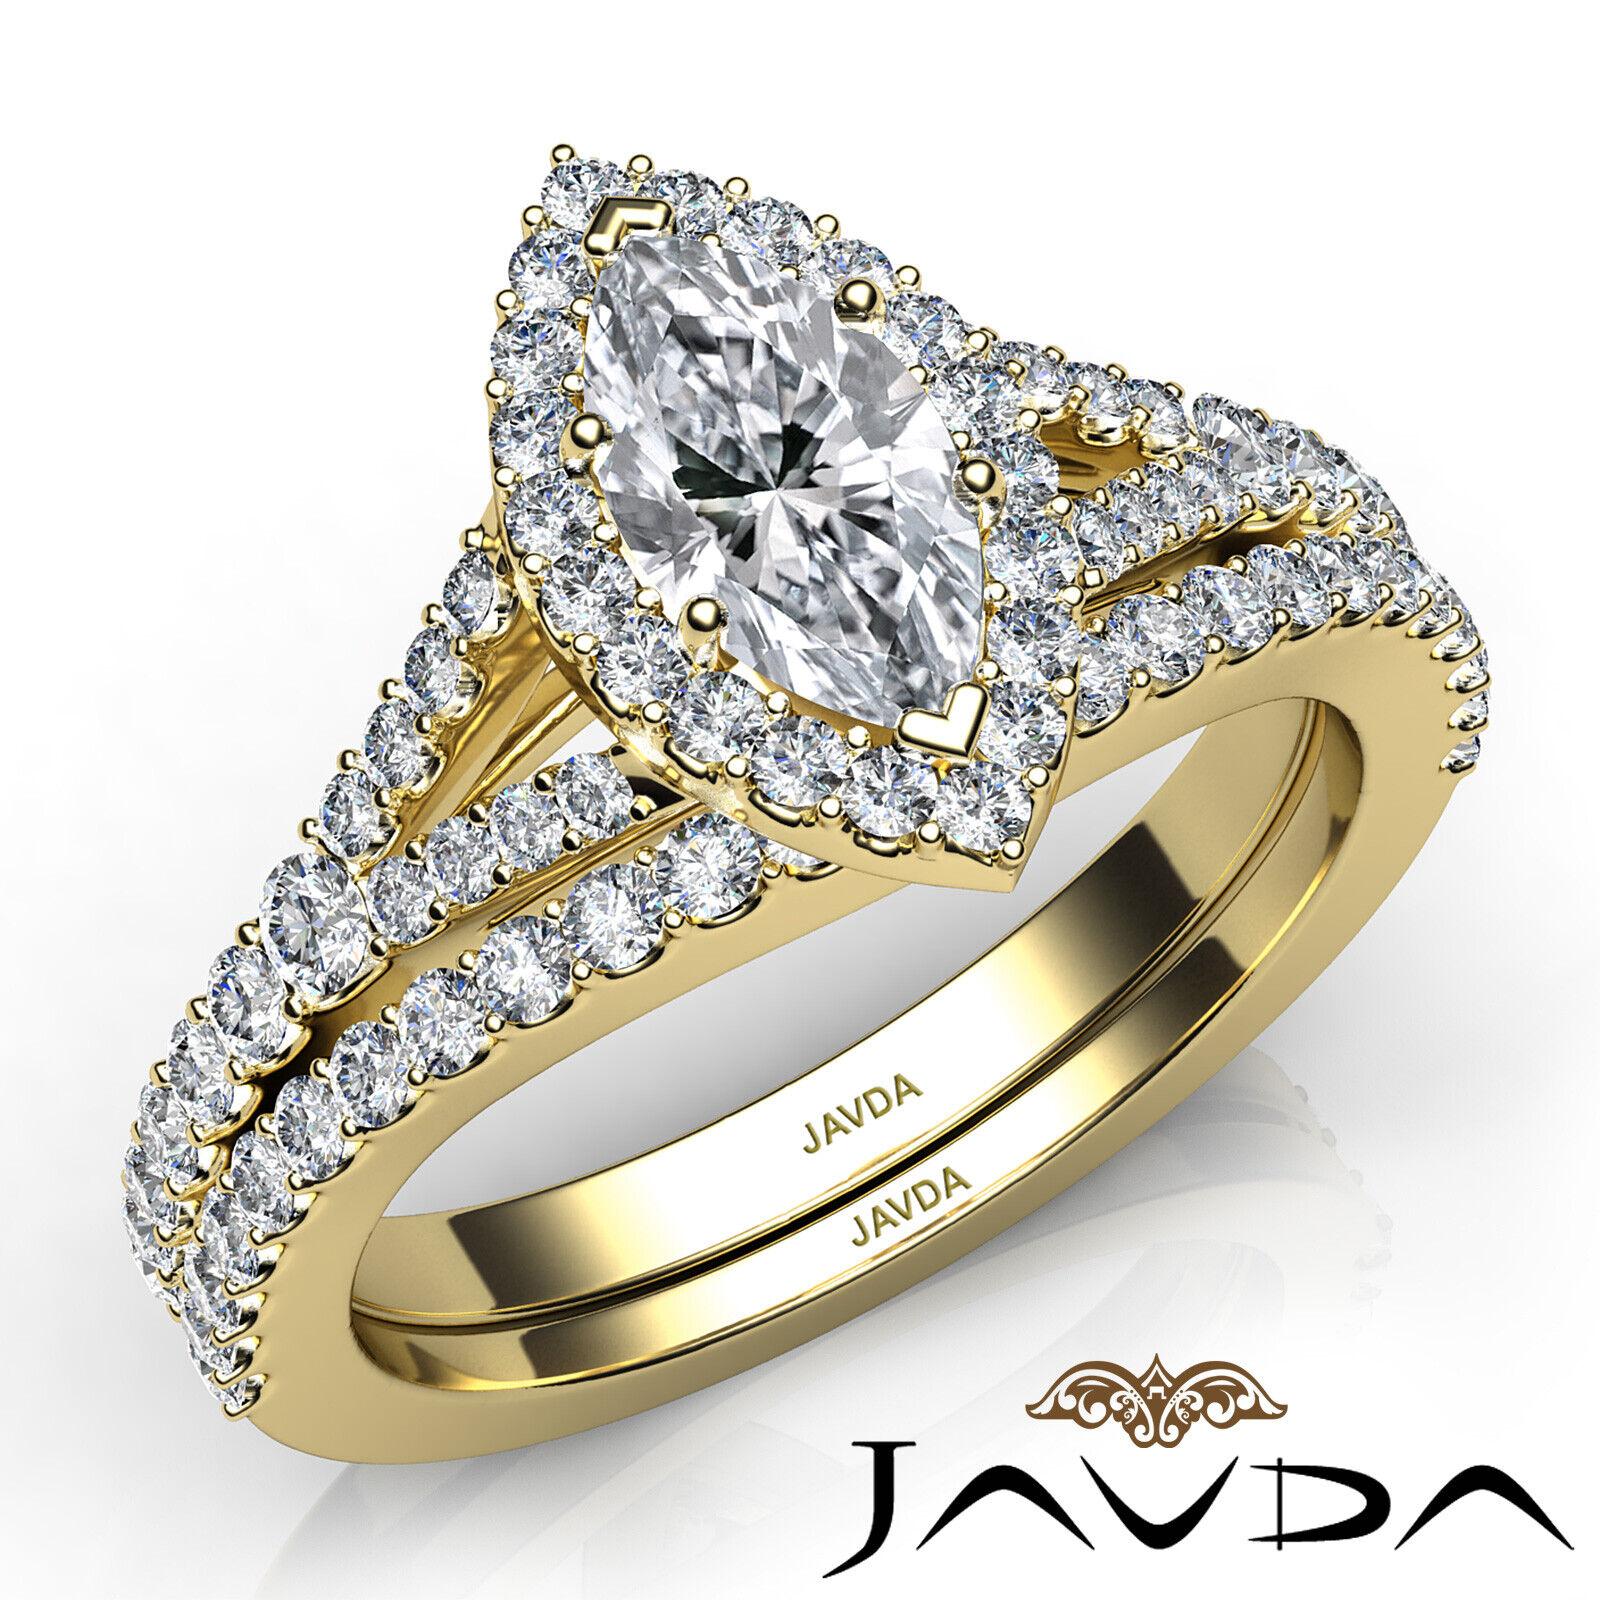 2.02ctw Halo Bridal Set Split Shank Marquise Diamond Engagement Ring GIA F-SI1 9